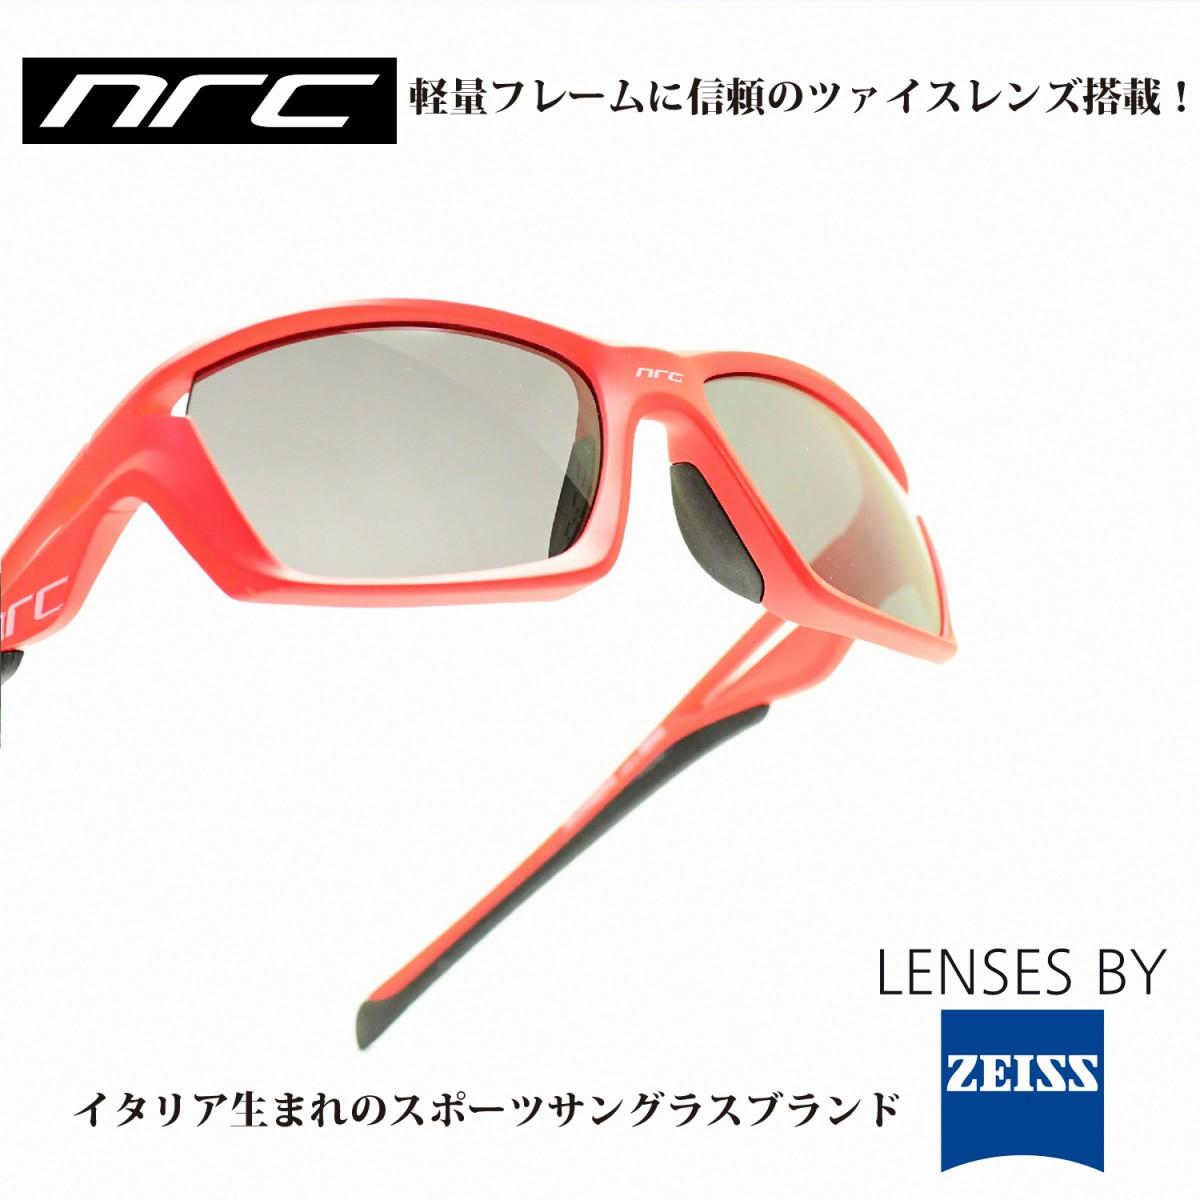 nrc エヌアールシーRX1 おすすめ MAGMAメガネ 度付き 眼鏡 めがね メンズ レディース おしゃれ レディース ブランド人気 おすすめ フレーム 流行り 度付き レンズ サングラス スポーツ, Laboratory of JUGEM:7601f1d0 --- sunward.msk.ru